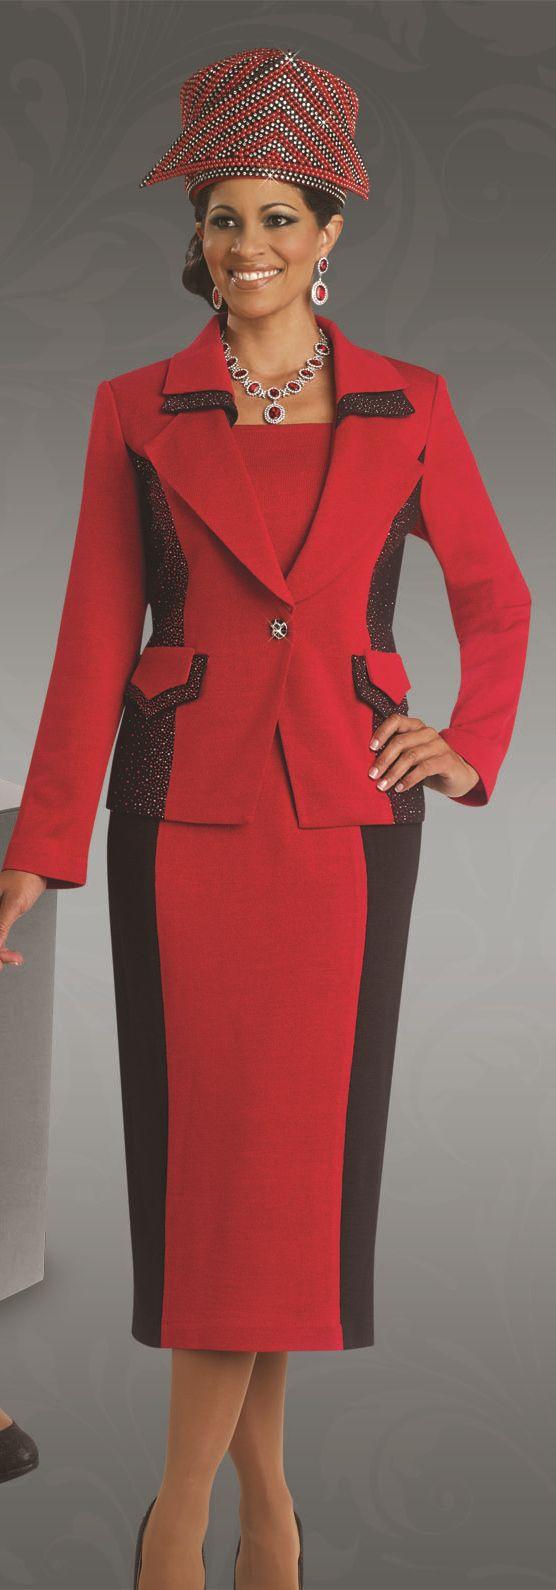 ed137ec3836 Donna Vinci 13102 Womens Knit Church Suit  French Novelty